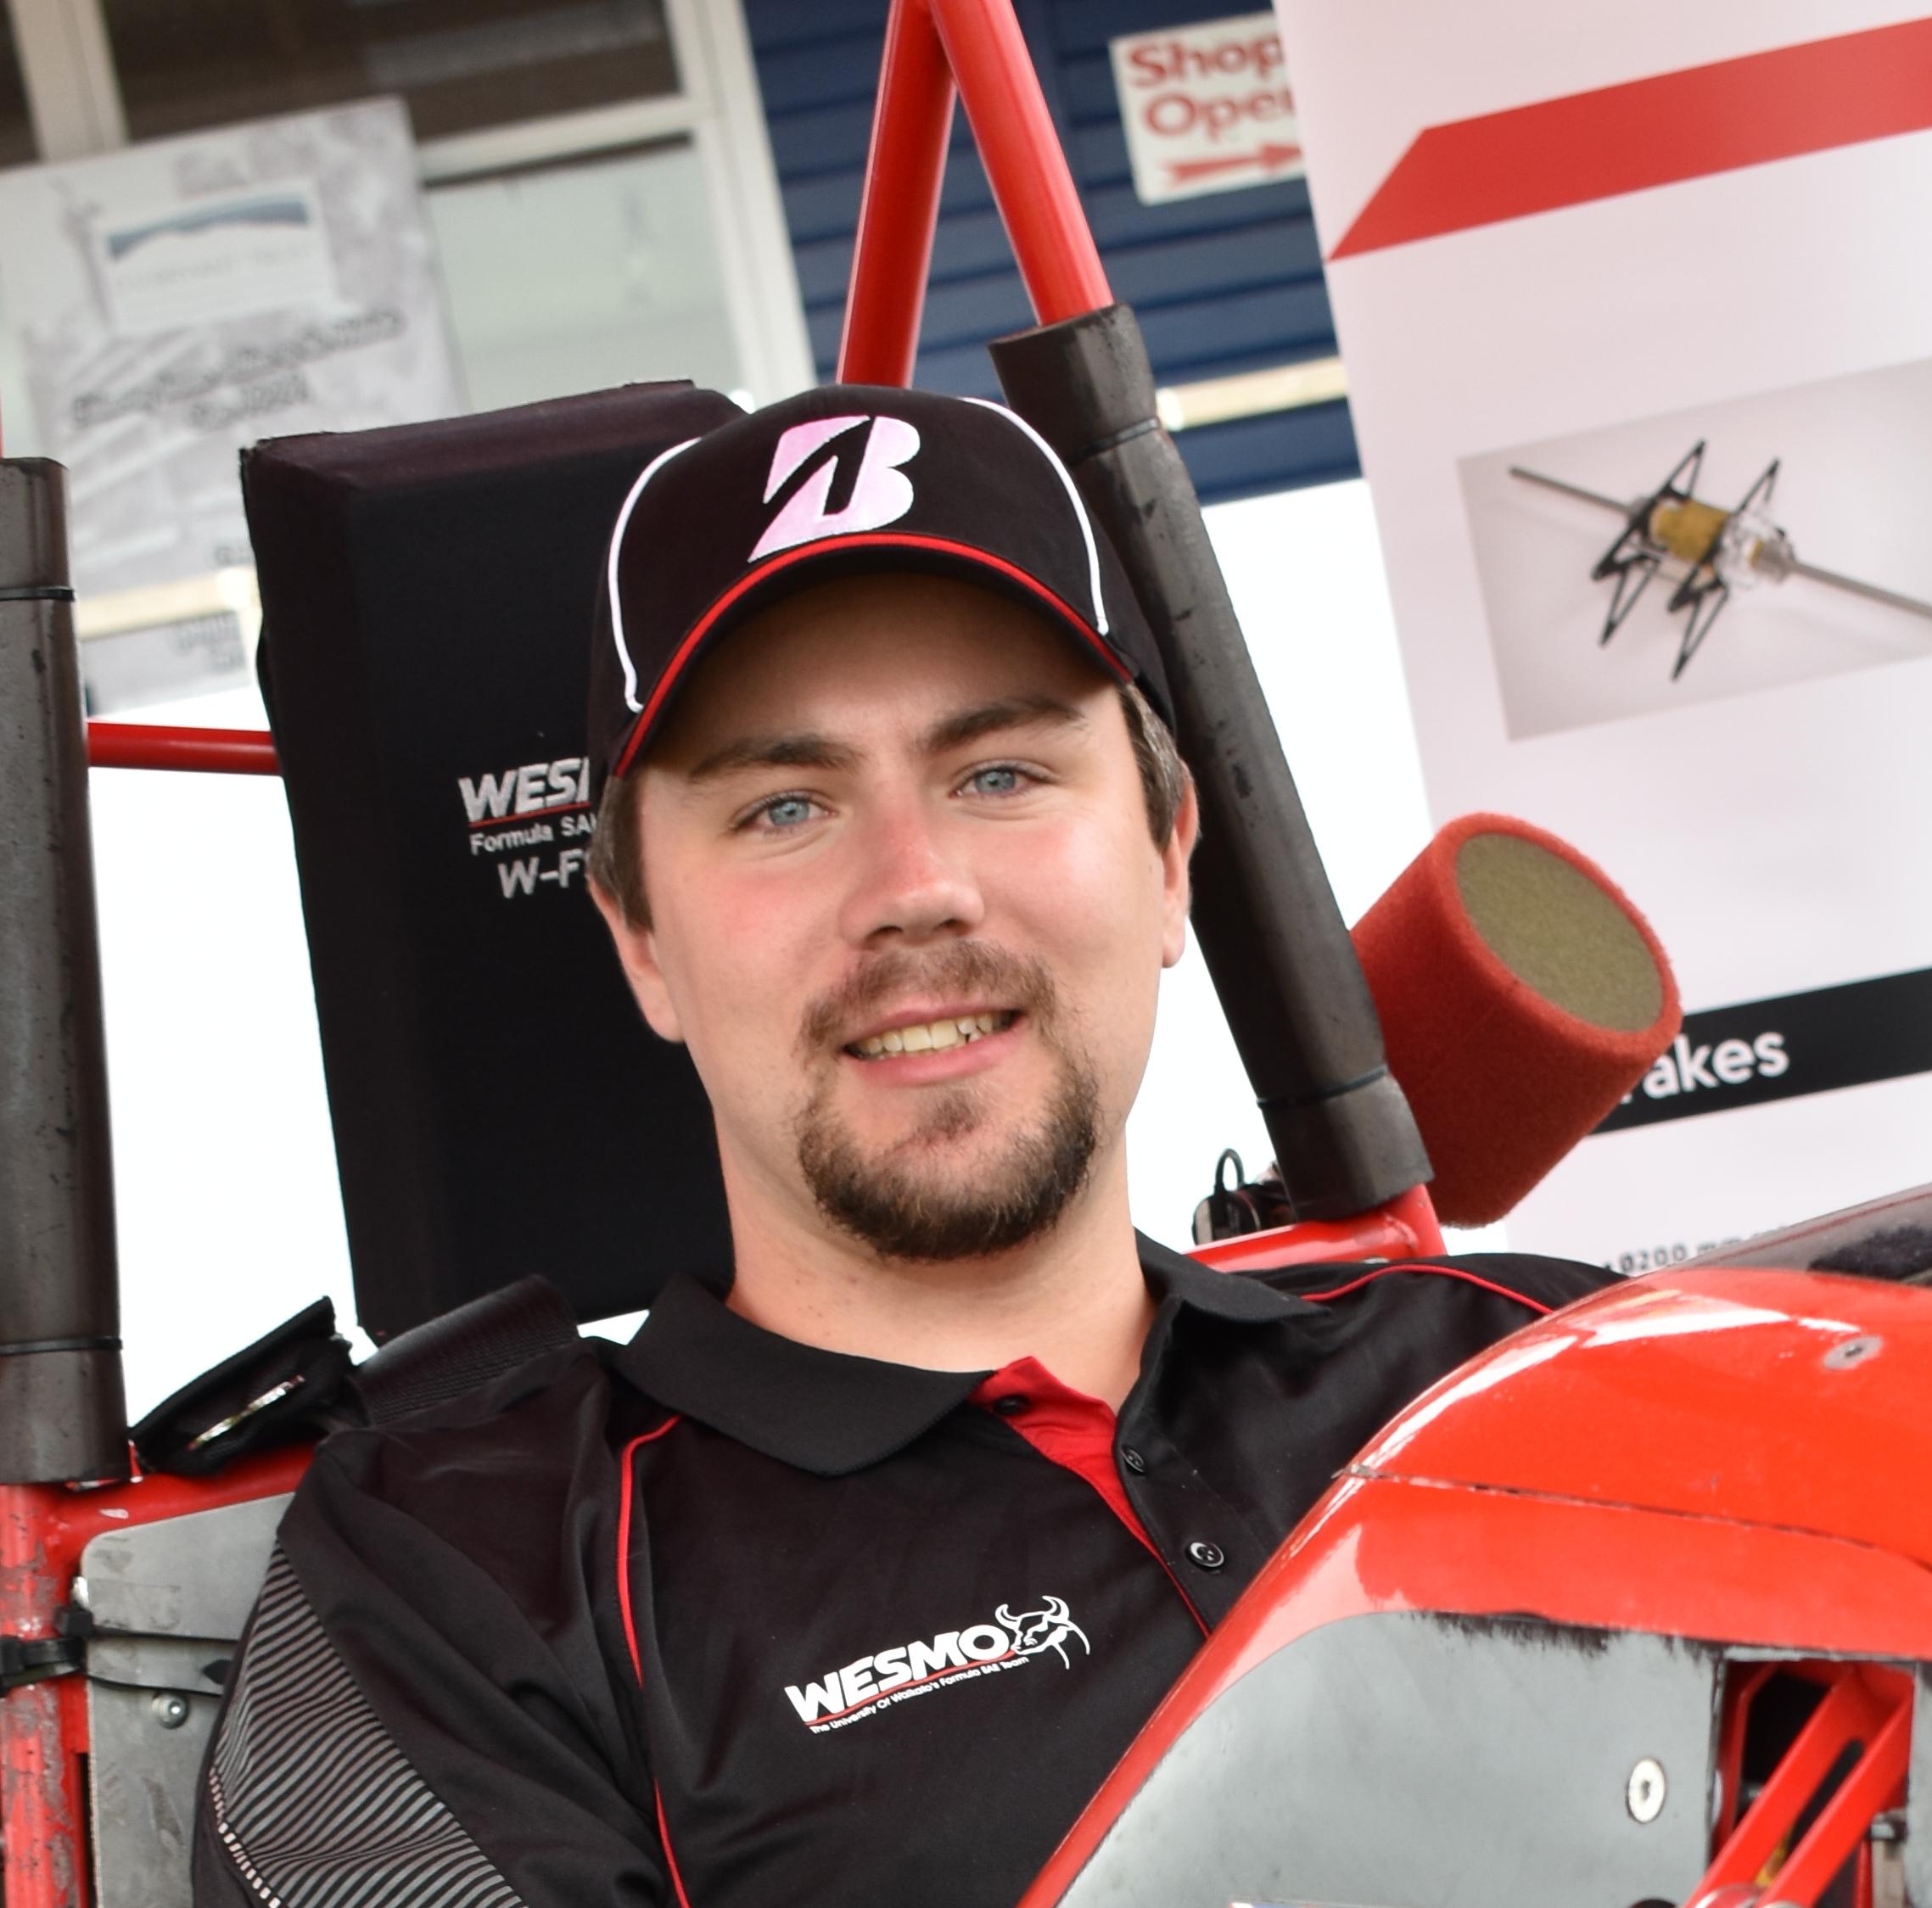 Jonathan van Harselaar